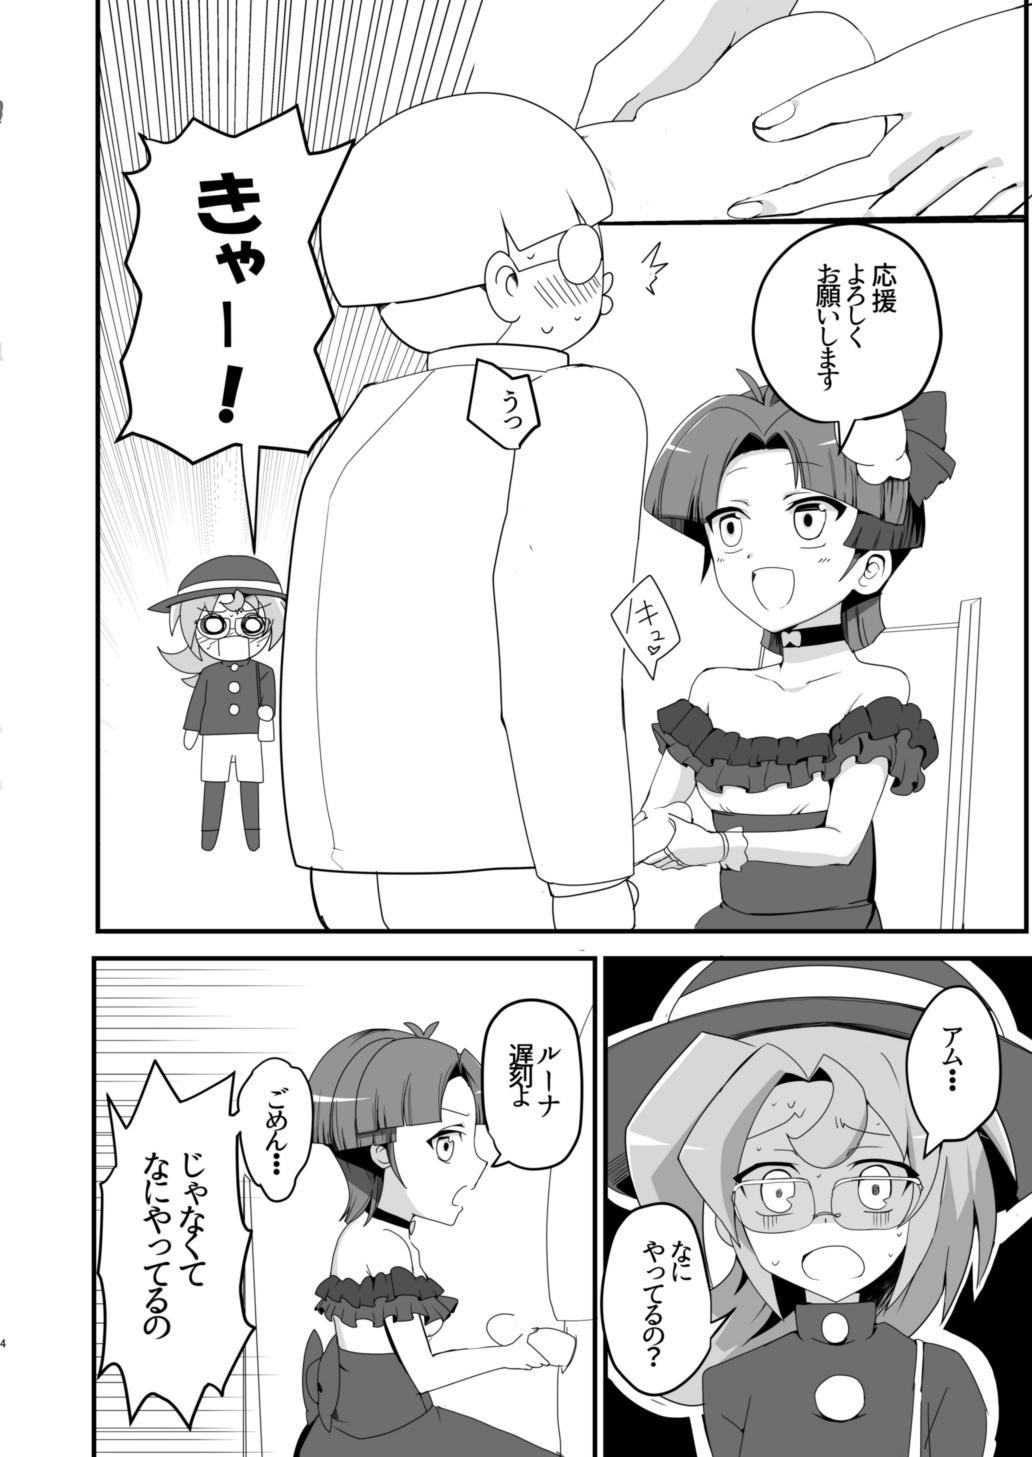 LunaAm O♂n♂n Akushuukai 2